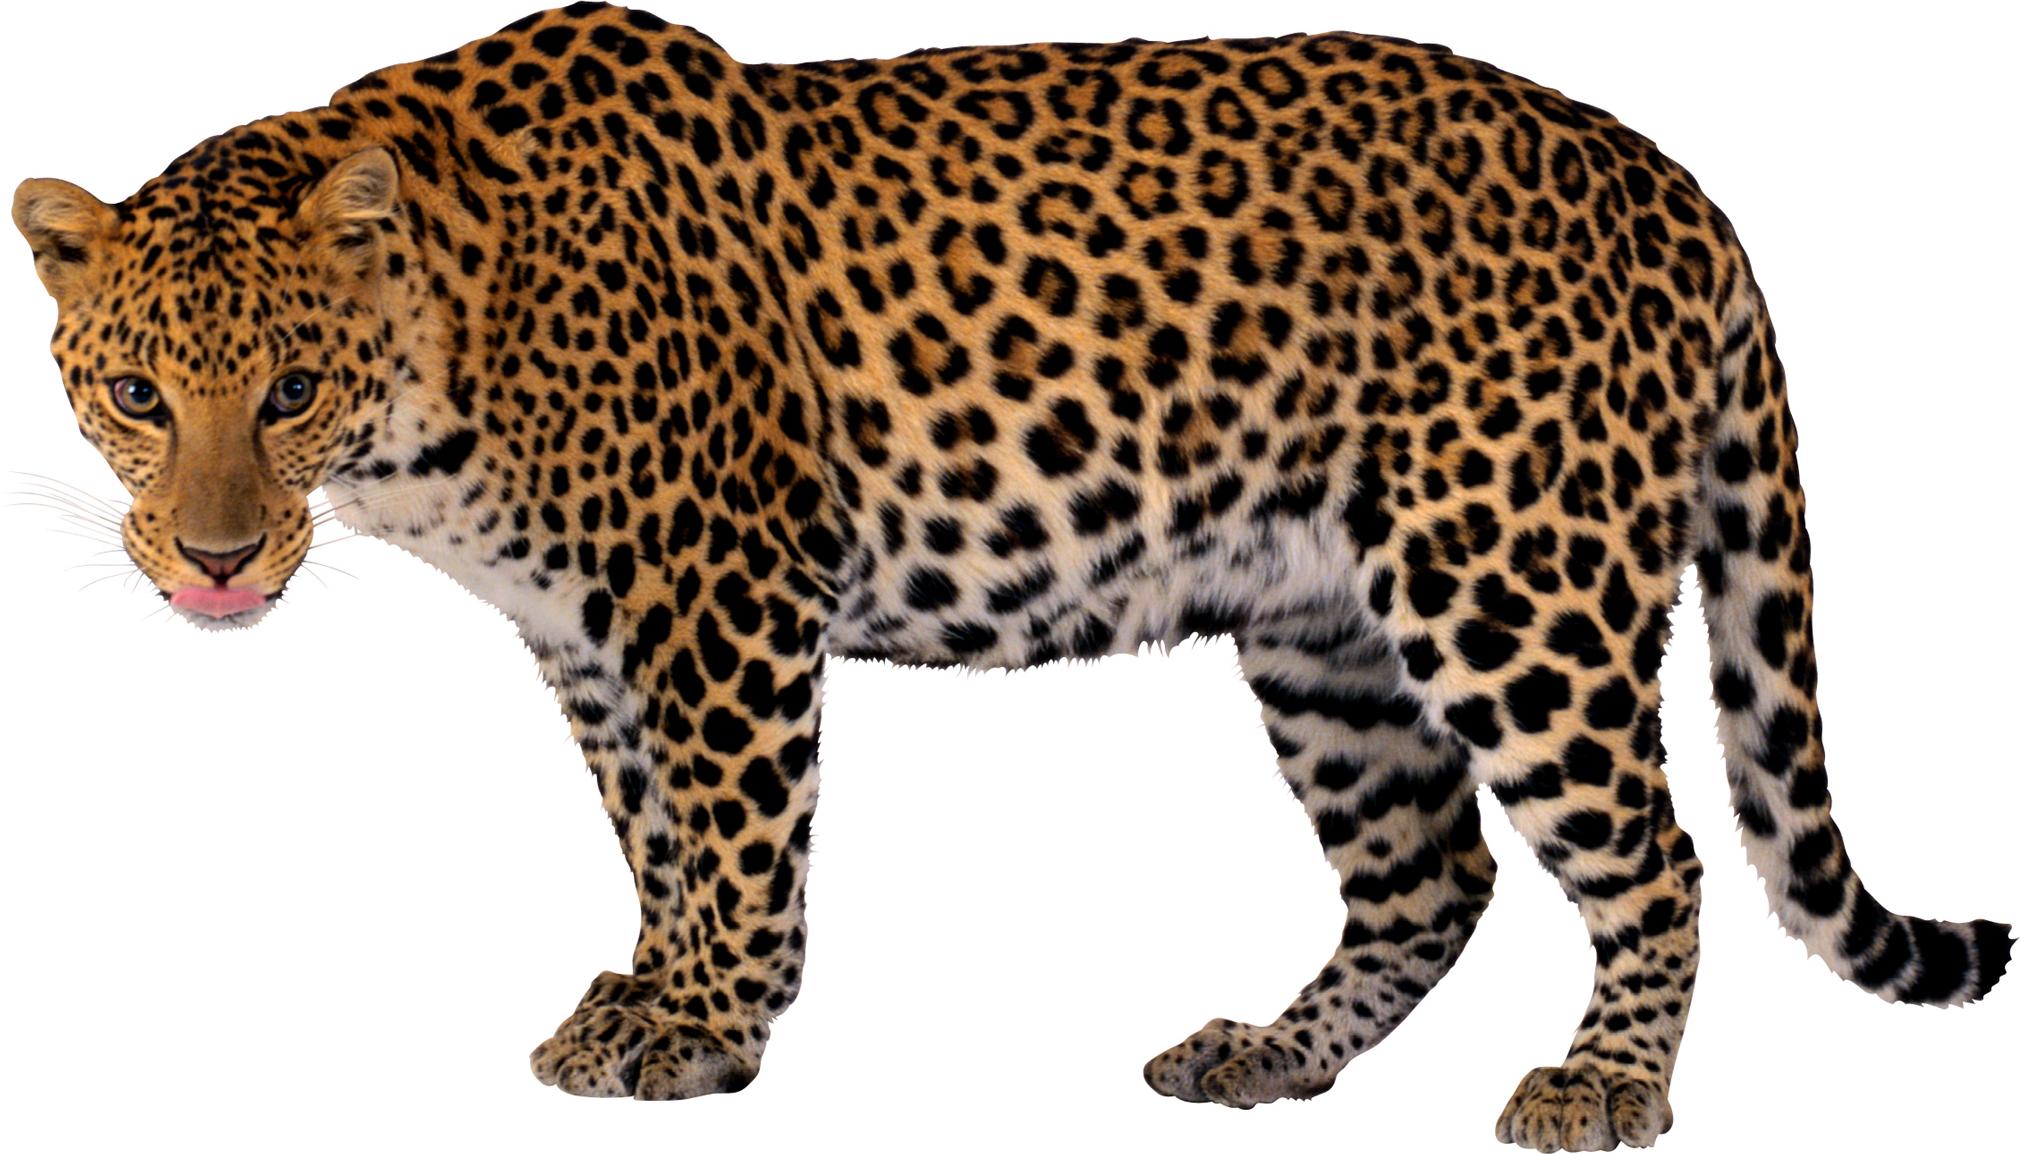 Leopard images download